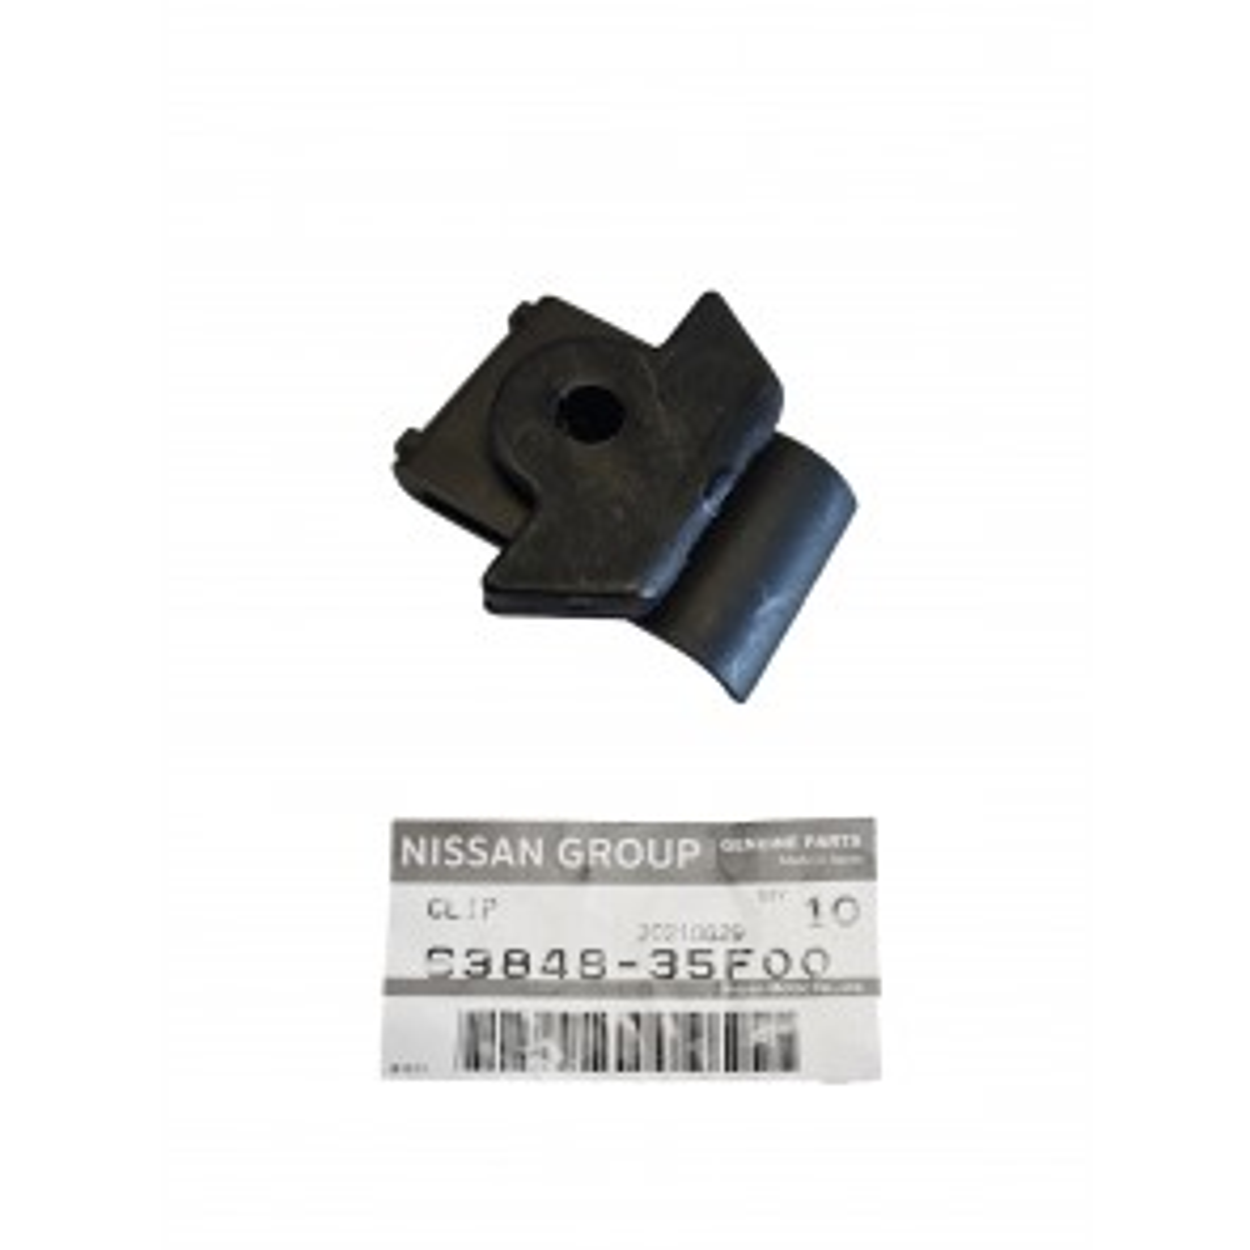 Genuine Nissan OEM Arch Liner Plastic Clip For Skyline R32 R33 GTST R34 GTT GTR Stagea C34 M35 Silvia S13 180SX Fairlady Z 350Z  63848-35F00